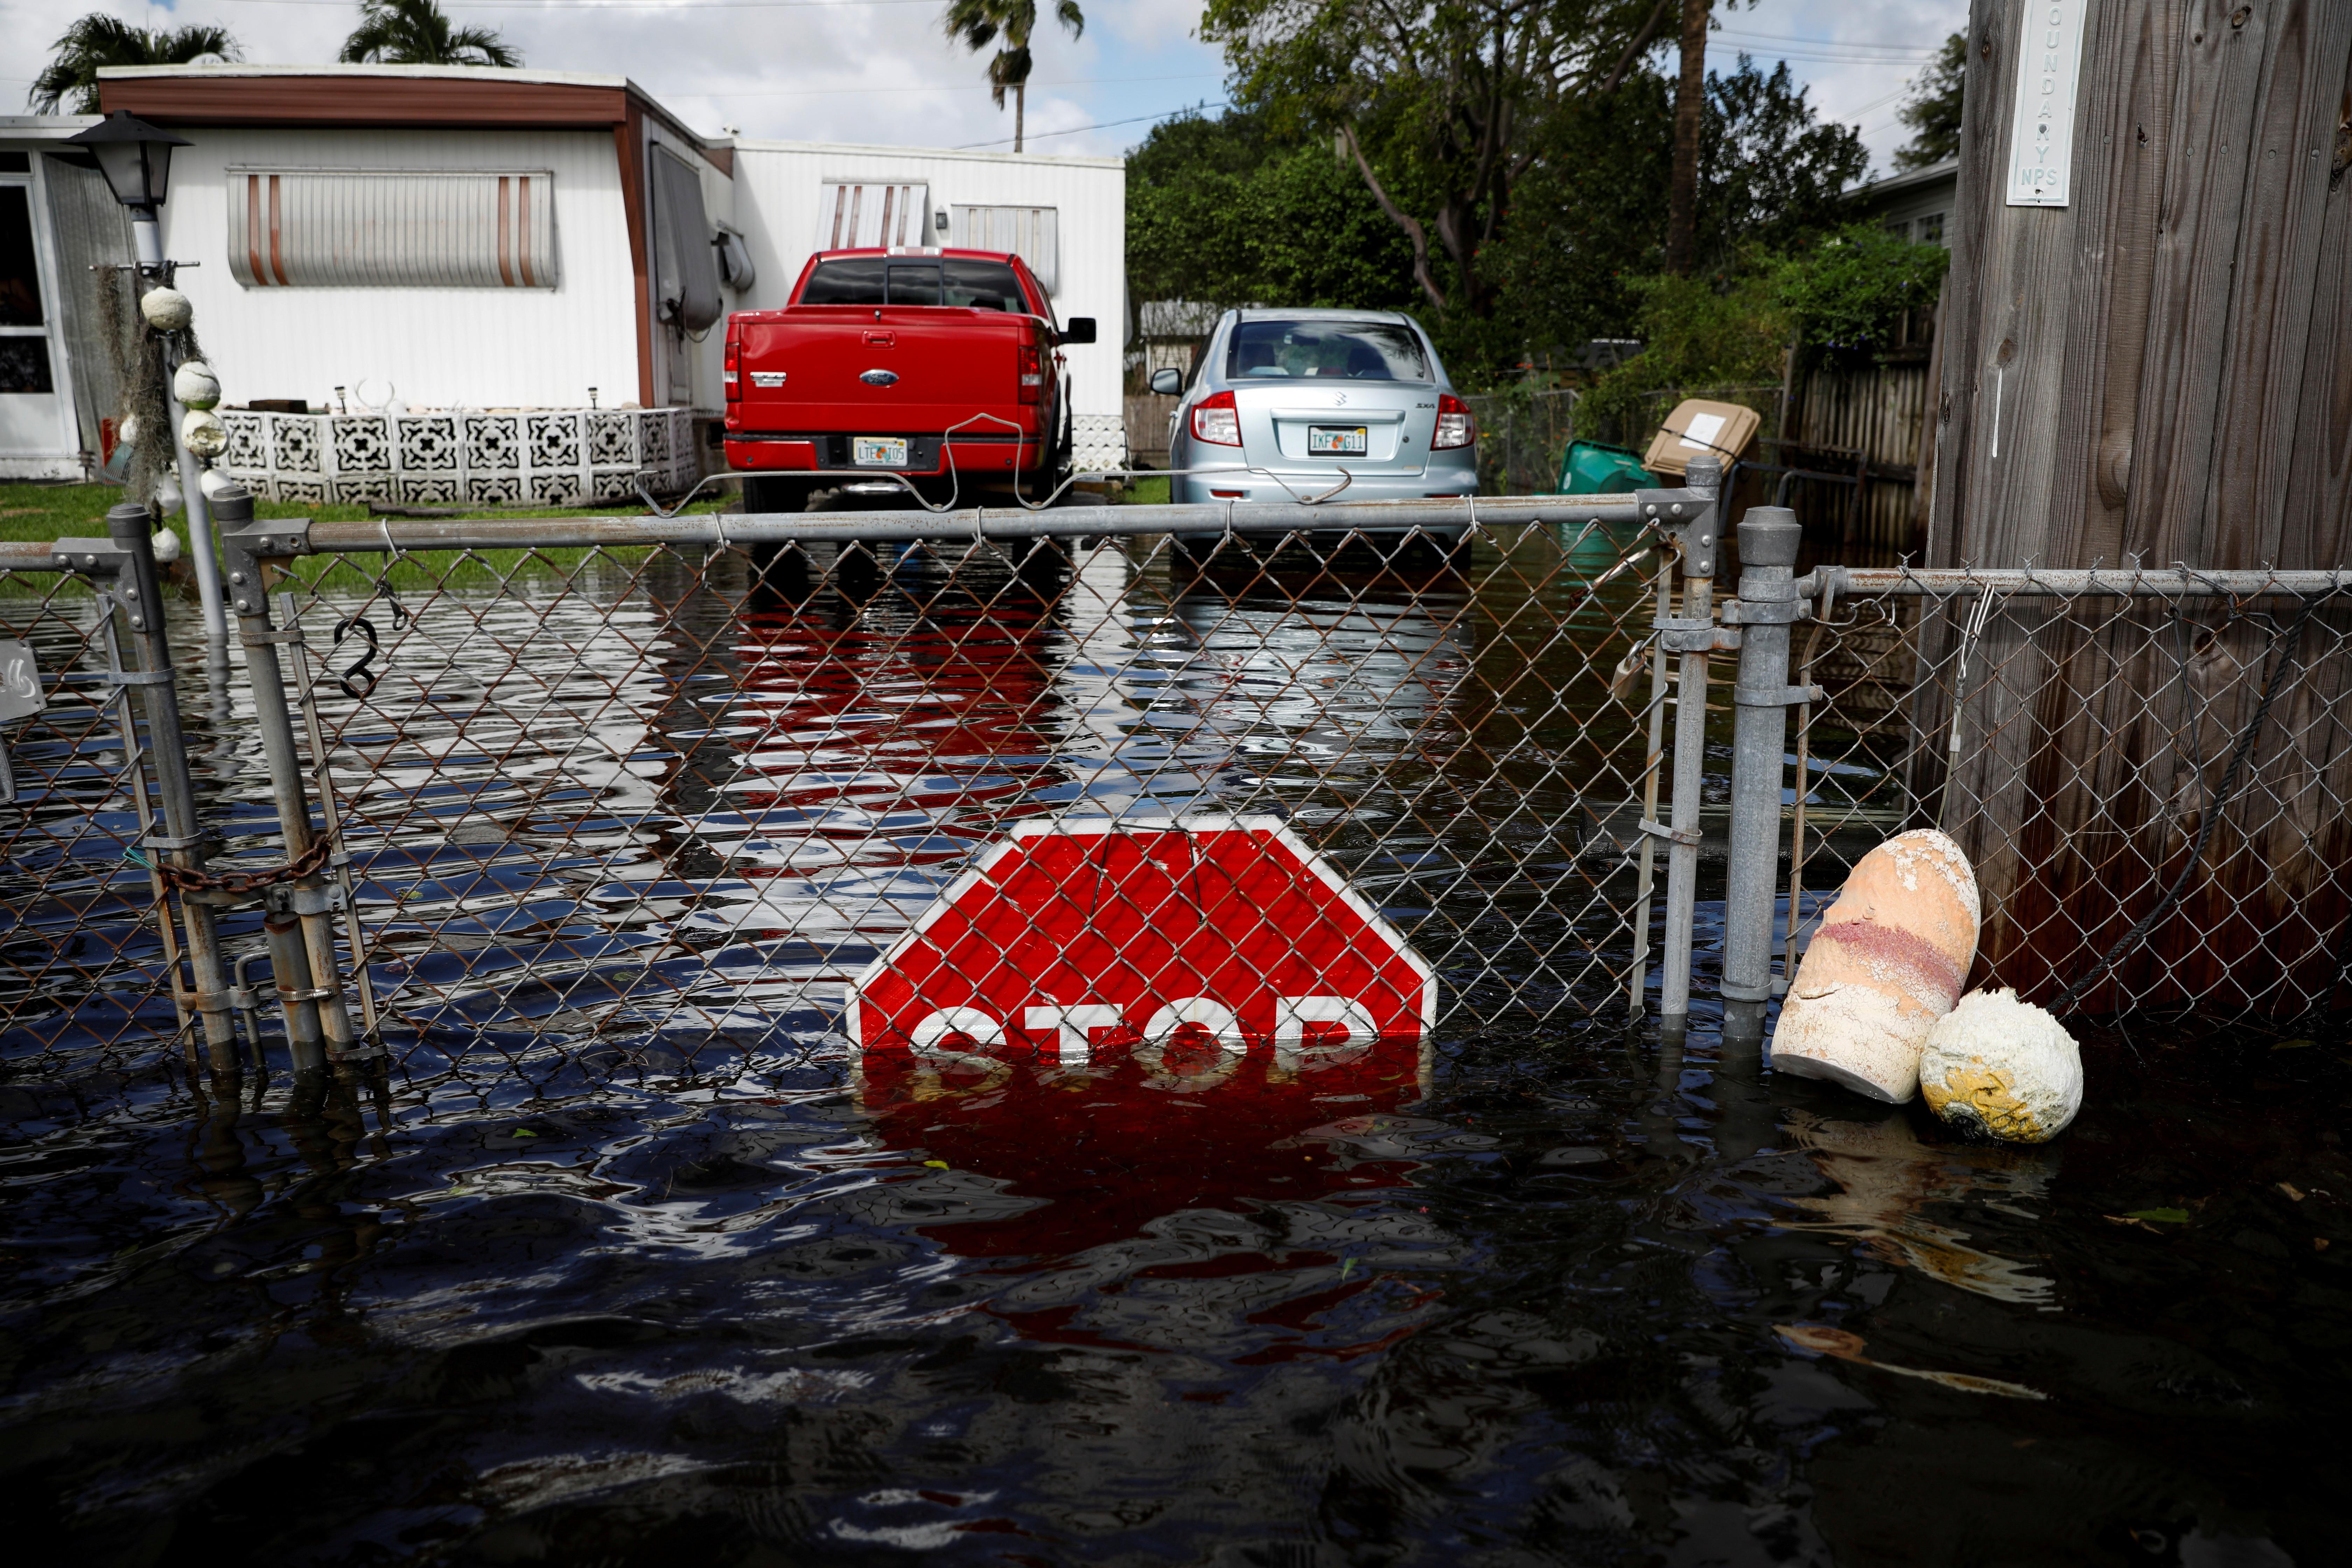 A flood caused by Tropical Storm Eta is seen in Davie, Florida, U.S., November 9, 2020.